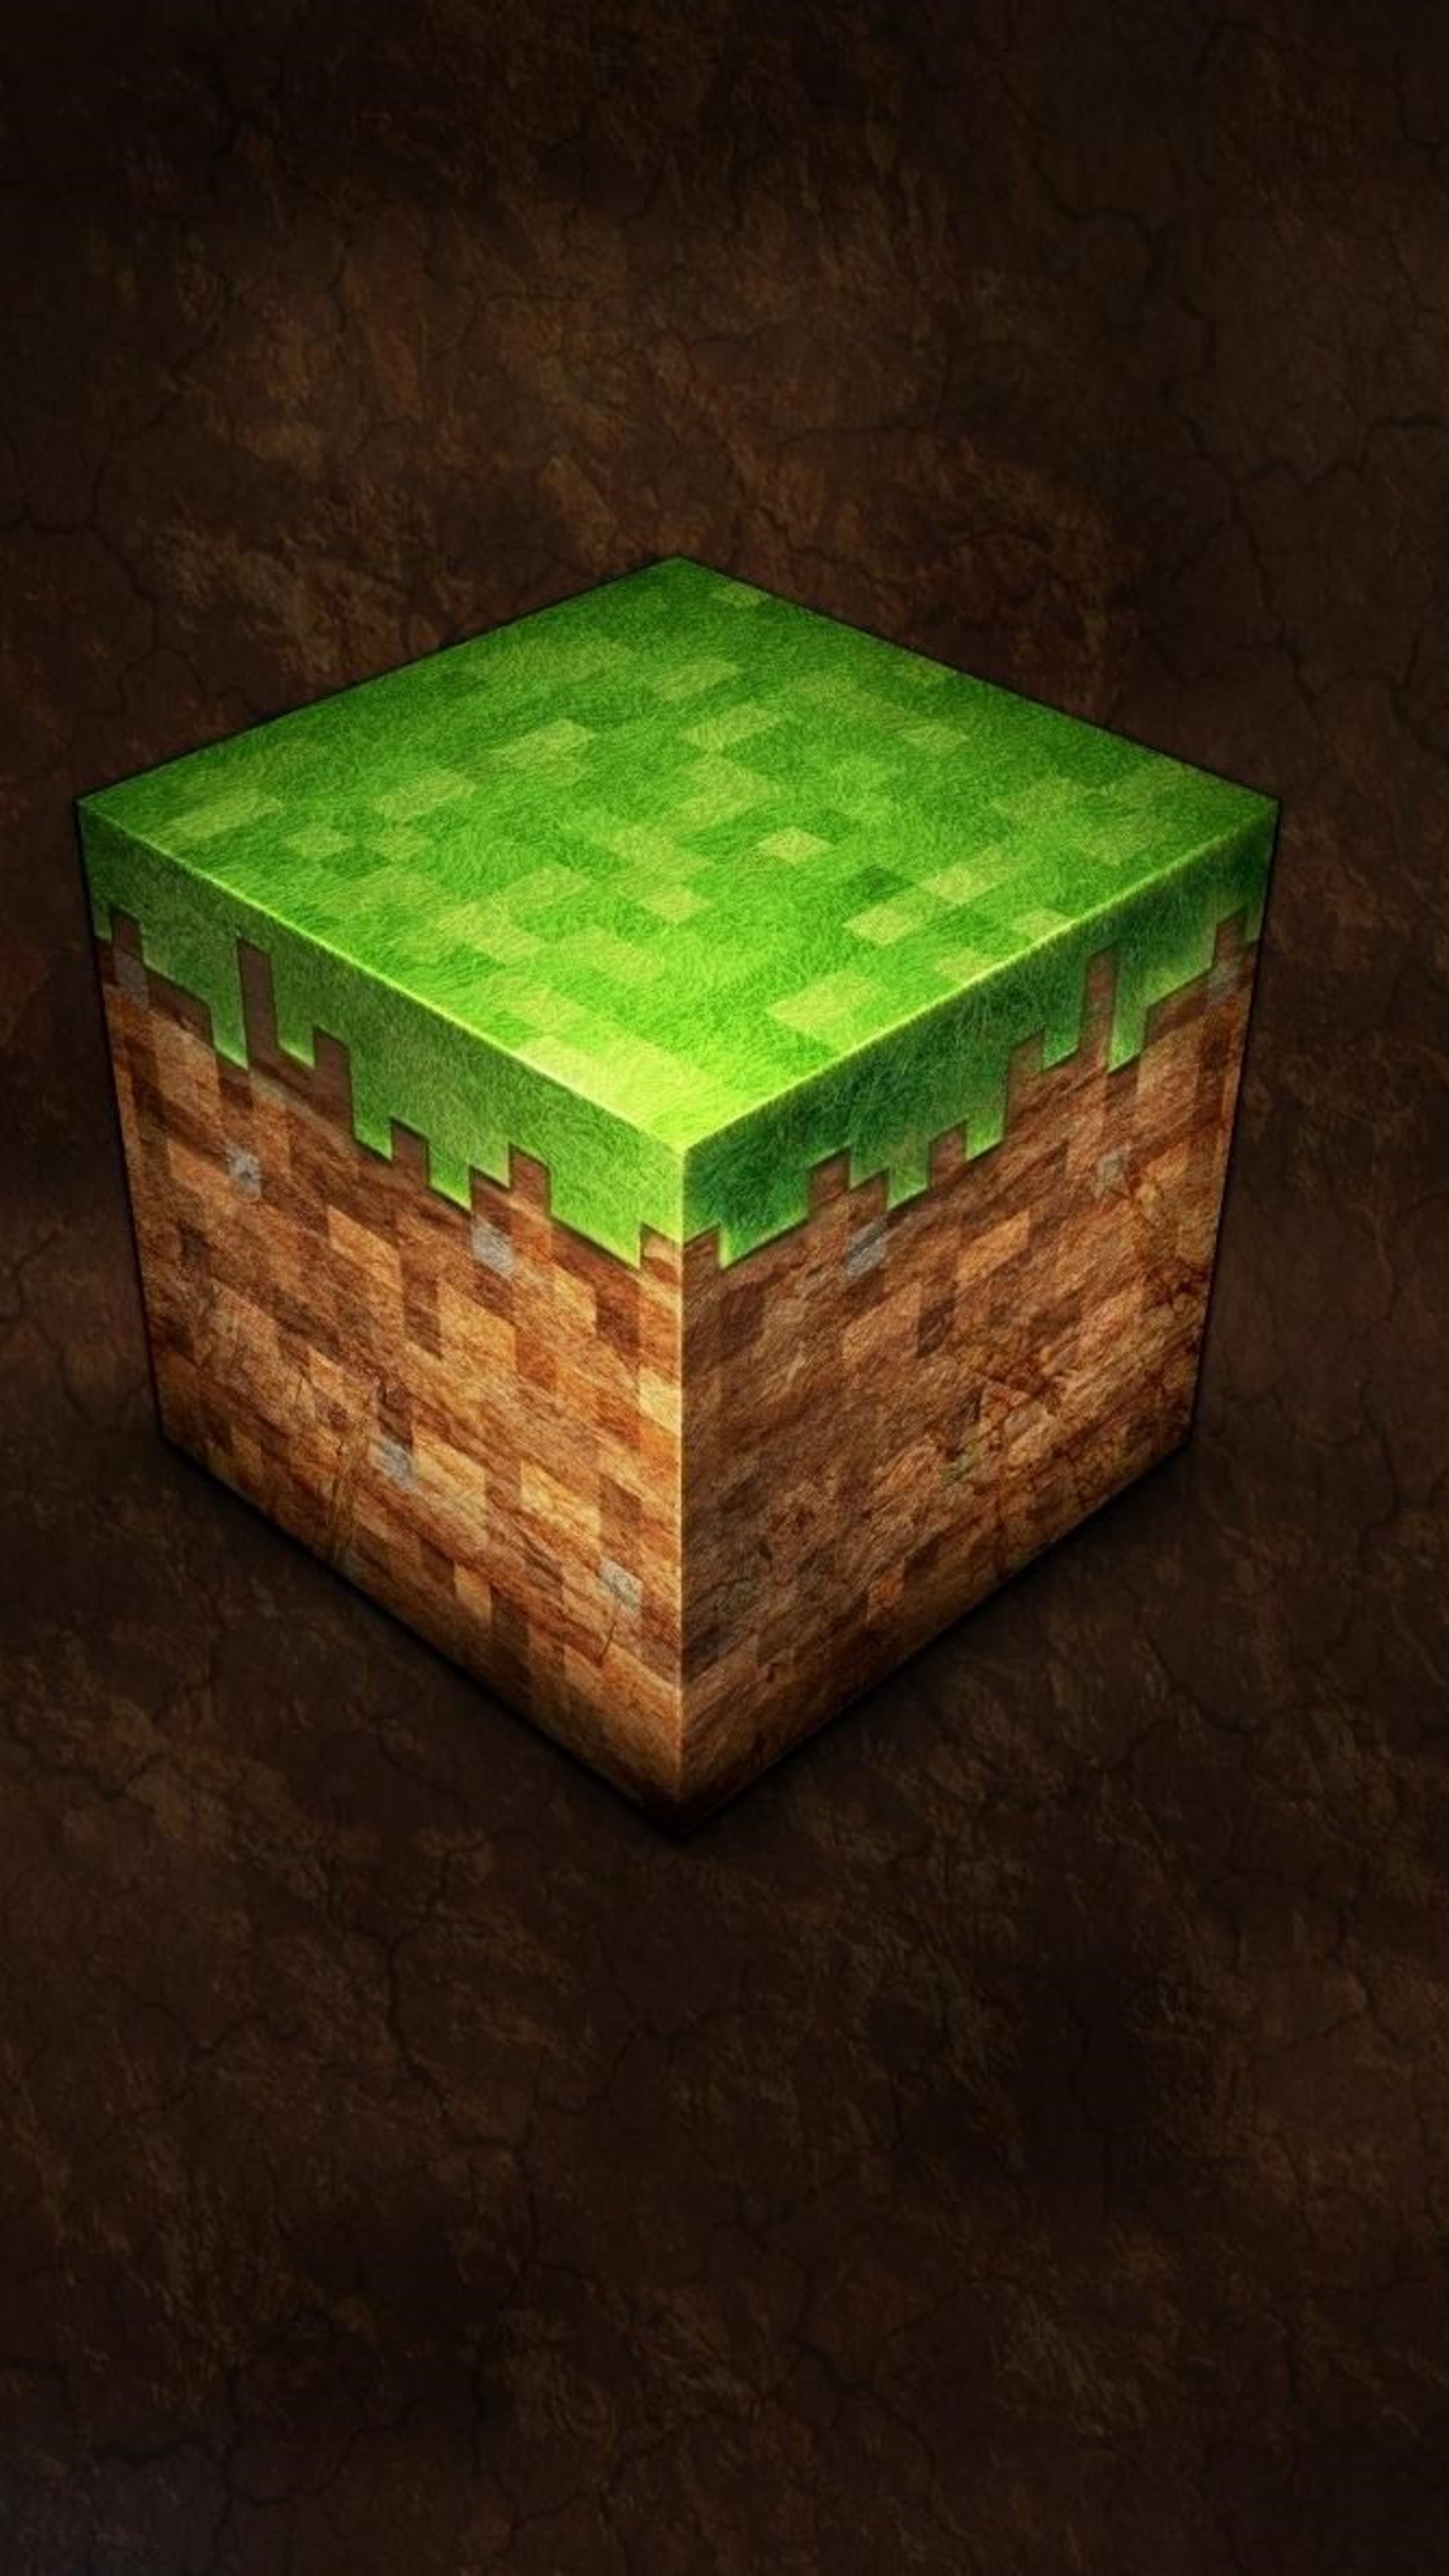 Must see Wallpaper Minecraft Samsung - Minecraft-Video-Game-Hd-Wallpaper-2160x3840  Trends_259951.jpg